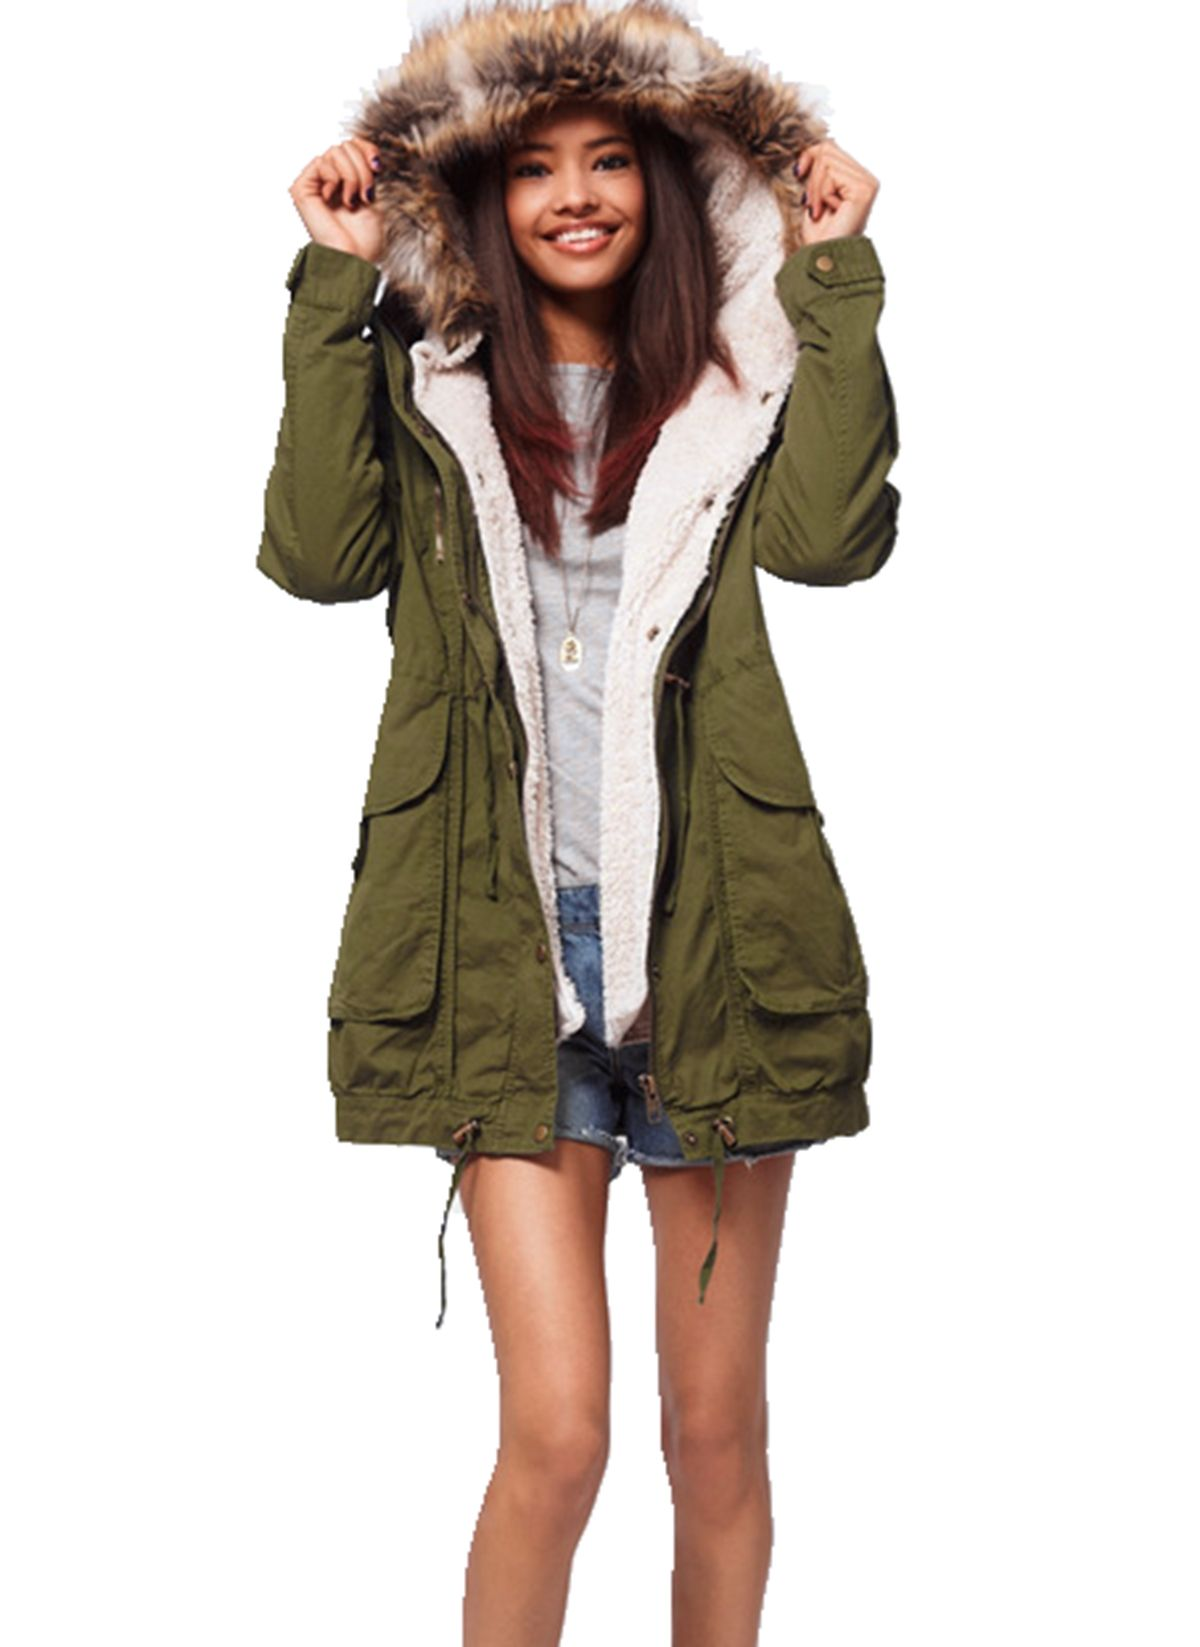 Women Thick Fleece Warm Faux Fur Coat Zip Hooded Parka Jackets Green Faux Fur Coat Fashion Warm Faux Fur Coat [ 1647 x 1200 Pixel ]